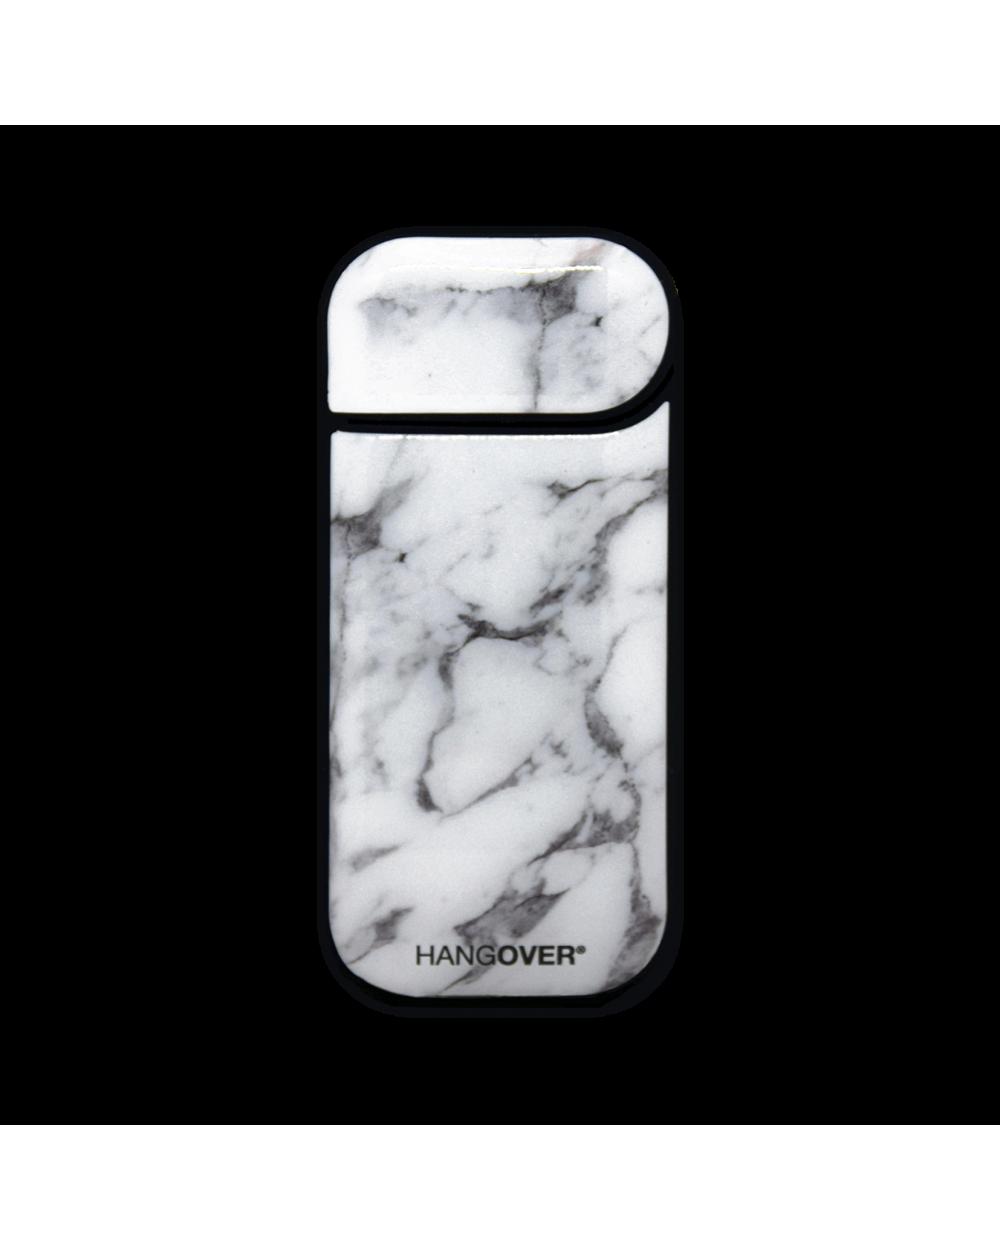 Marble Carrara - Cover SmartSkin Adesiva in Resina Speciale per Iqos 2.4 e 2.4 plus by Hangover